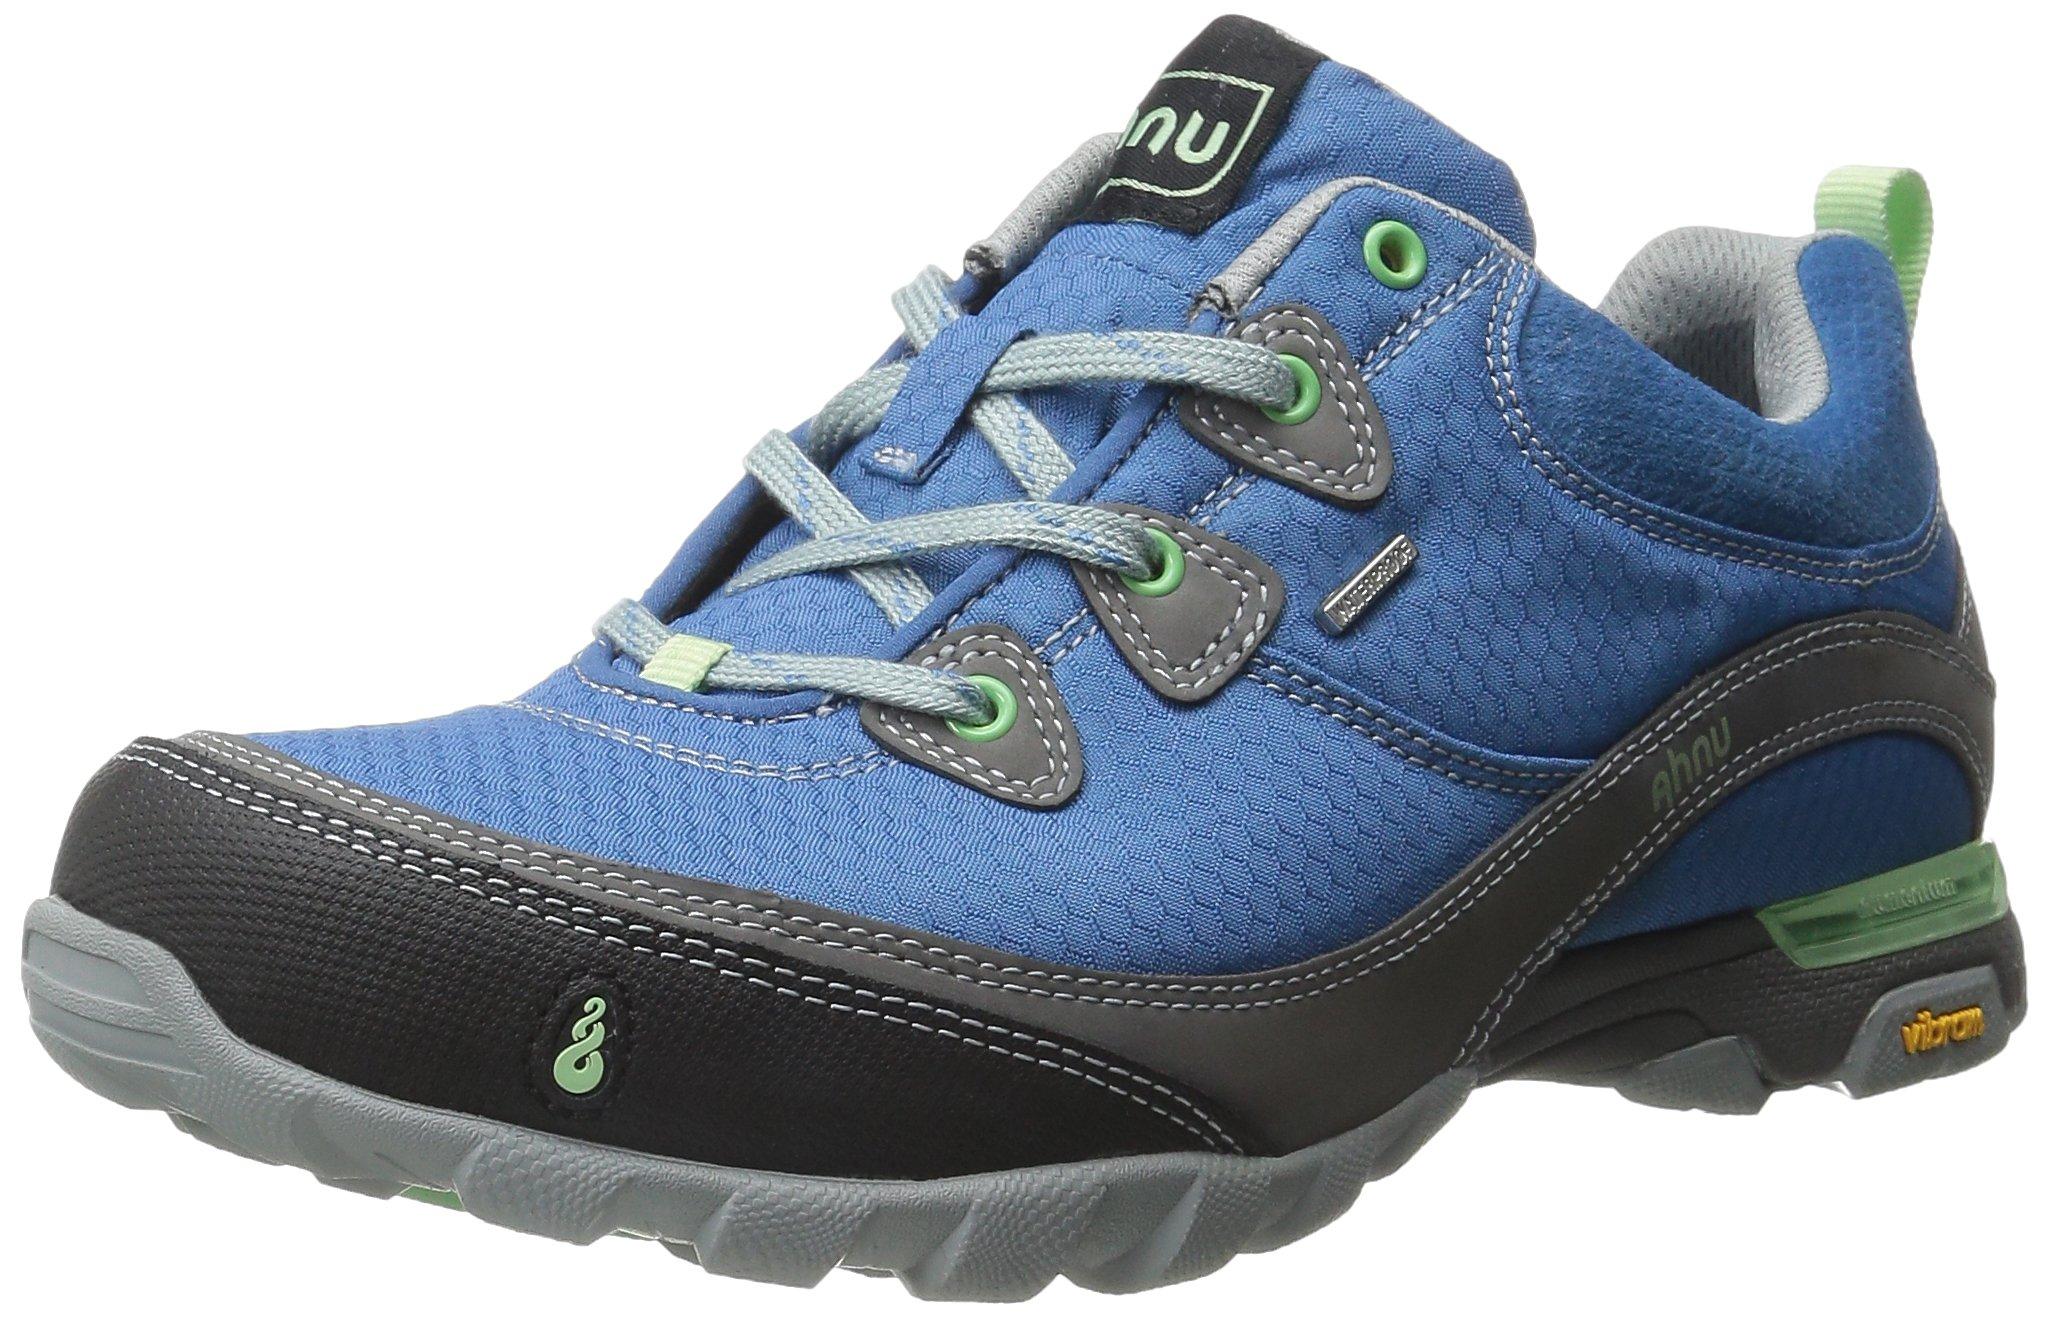 Ahnu Women's Sugarpine Waterproof Hiking Shoe, Bluestar, 6 M US